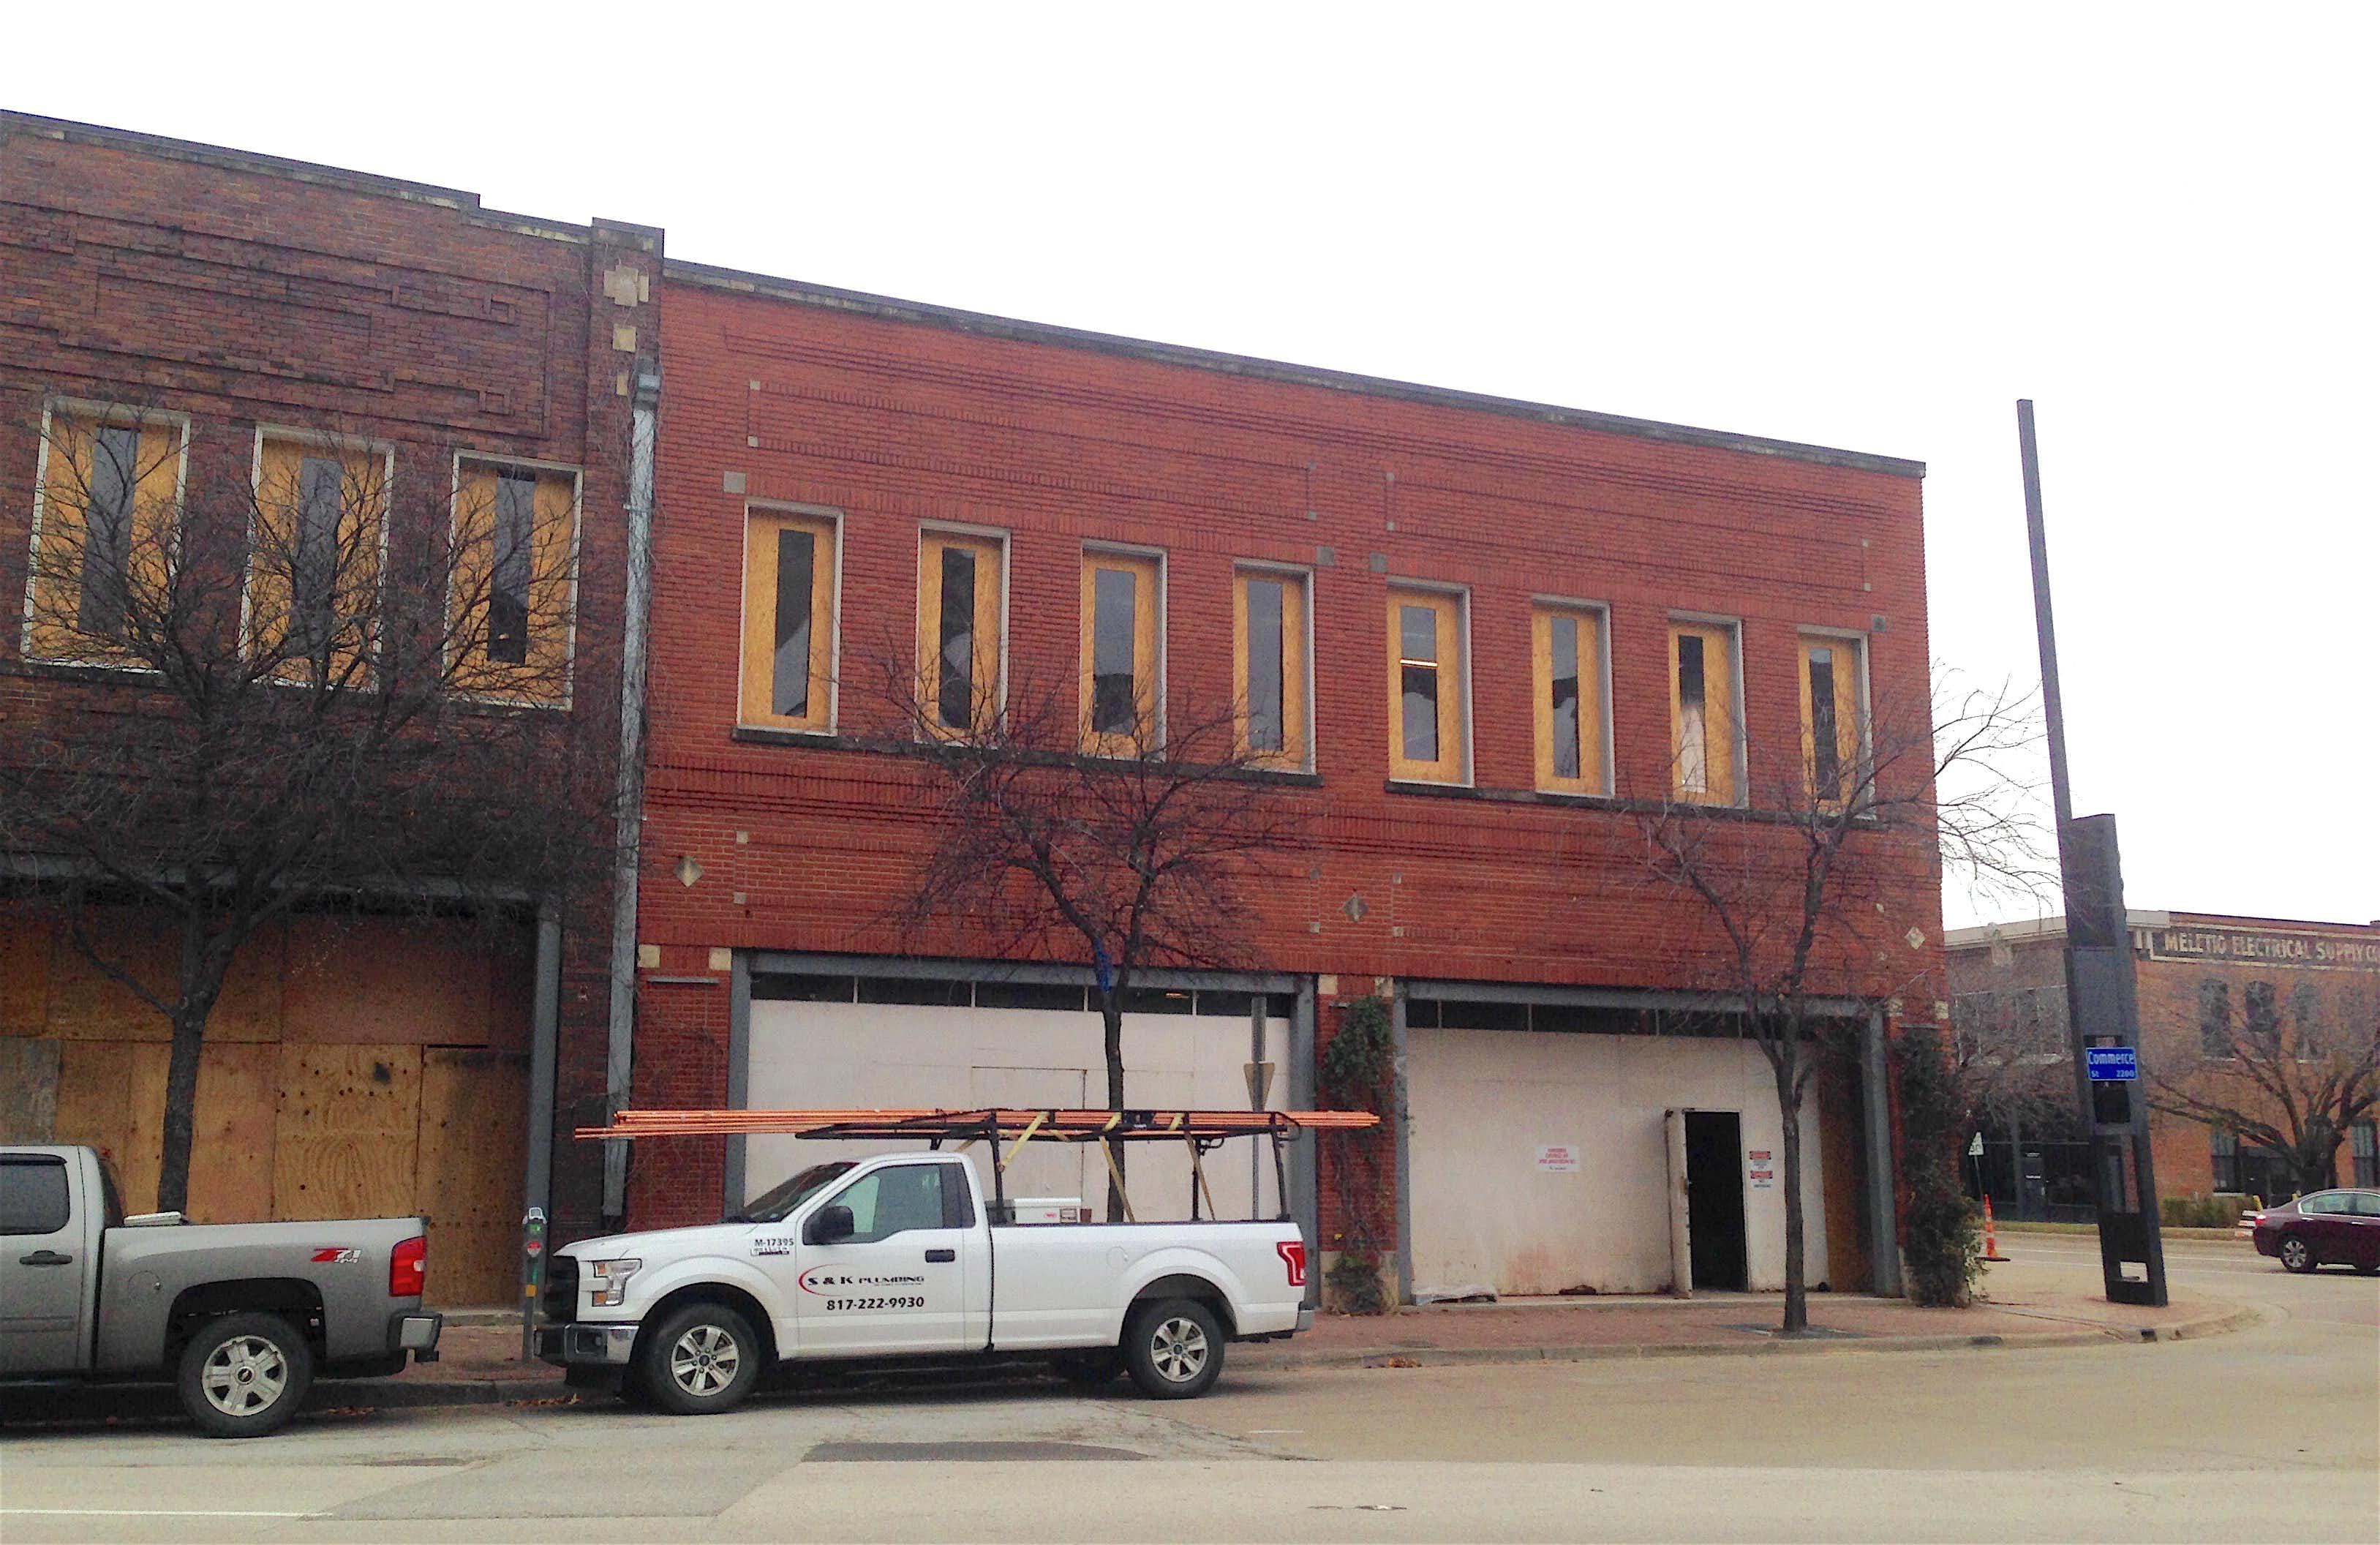 Downtown' Dallas' East Quarter redevelopment lands a major tech tenant